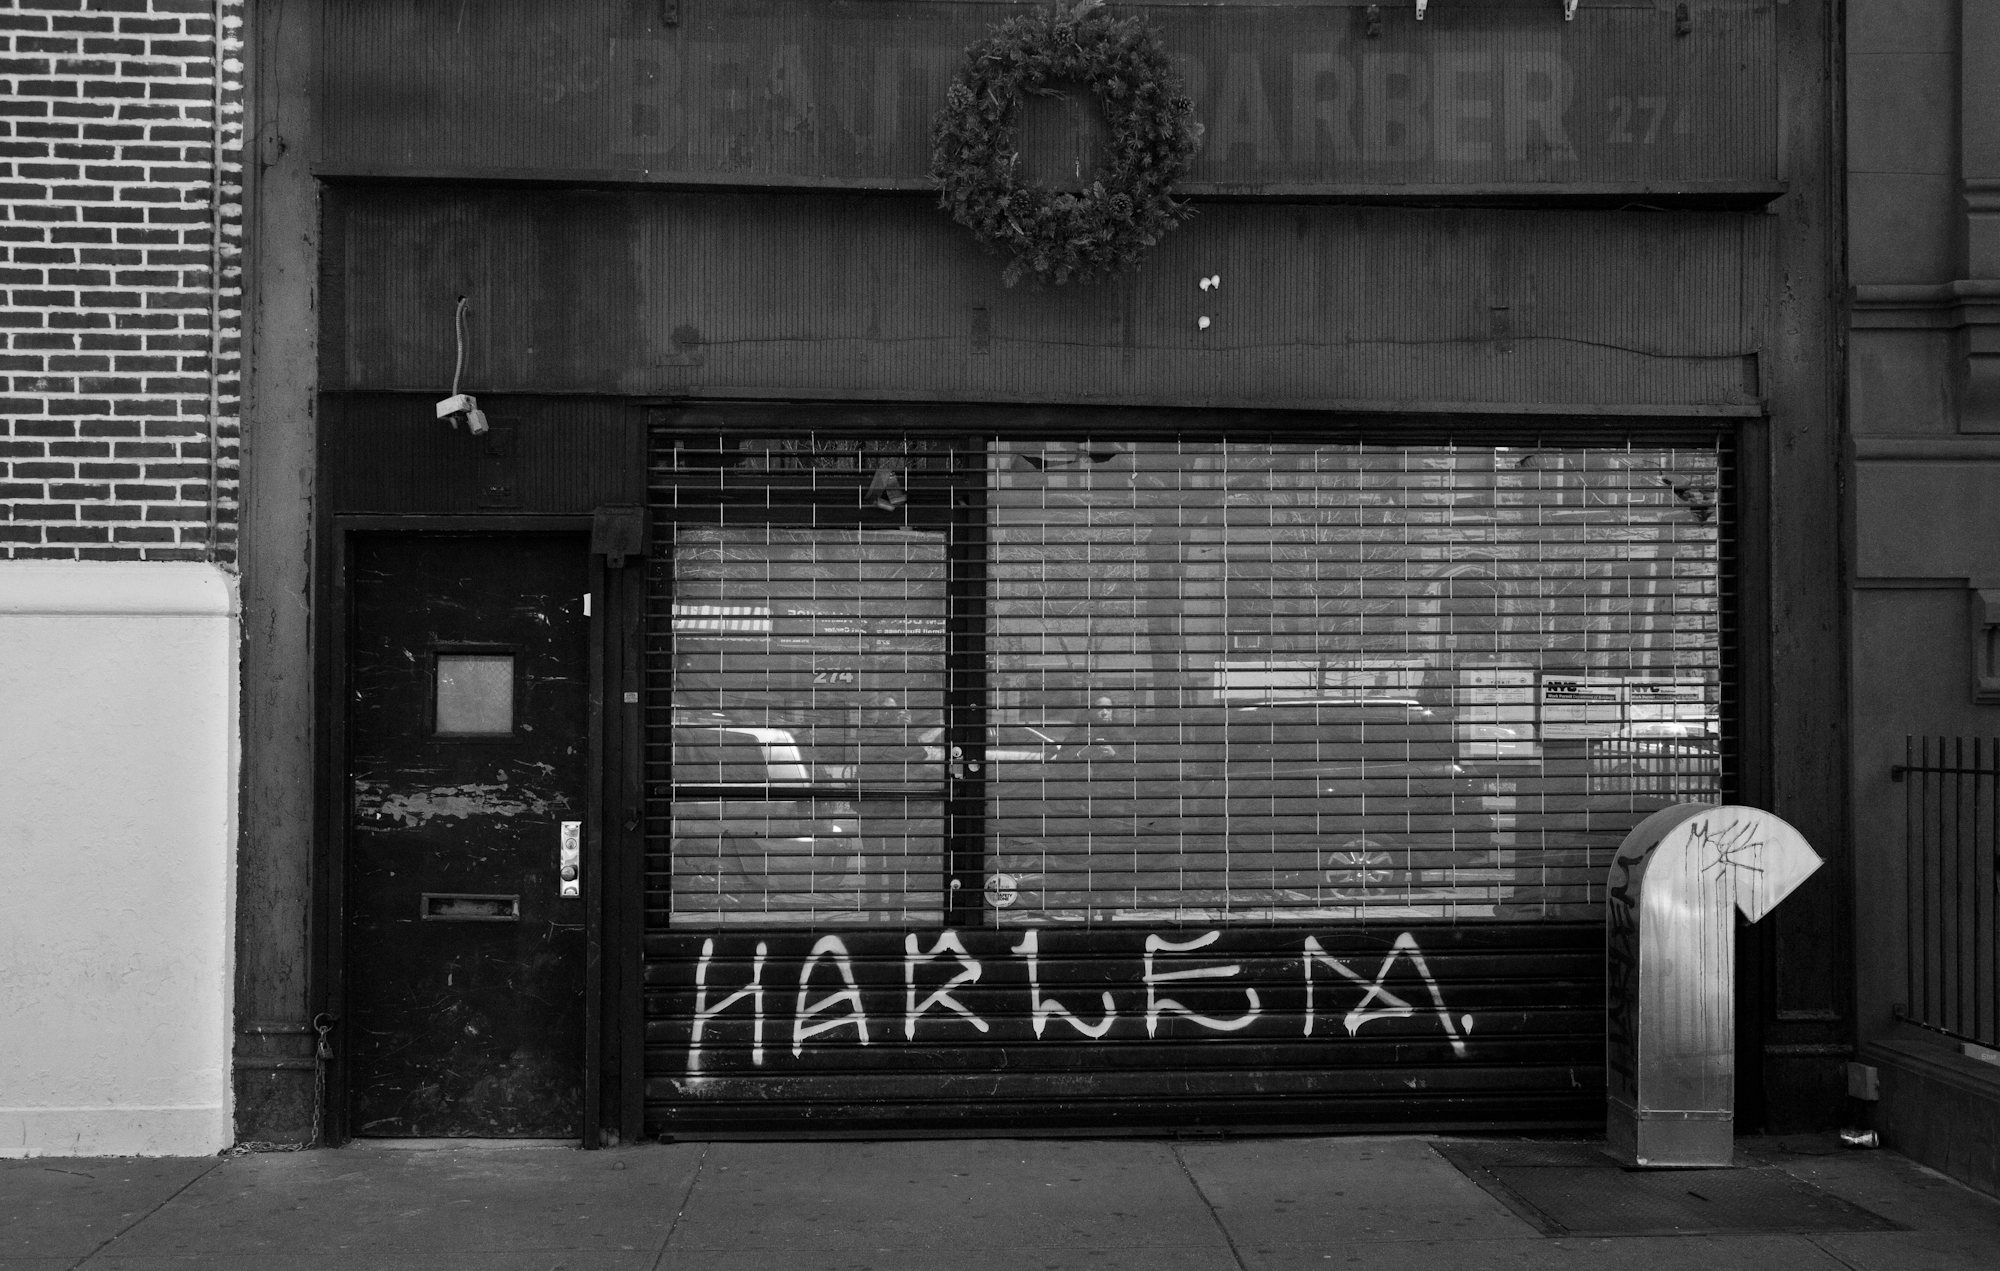 Harlem, NY 2015 - Kate Sterlin